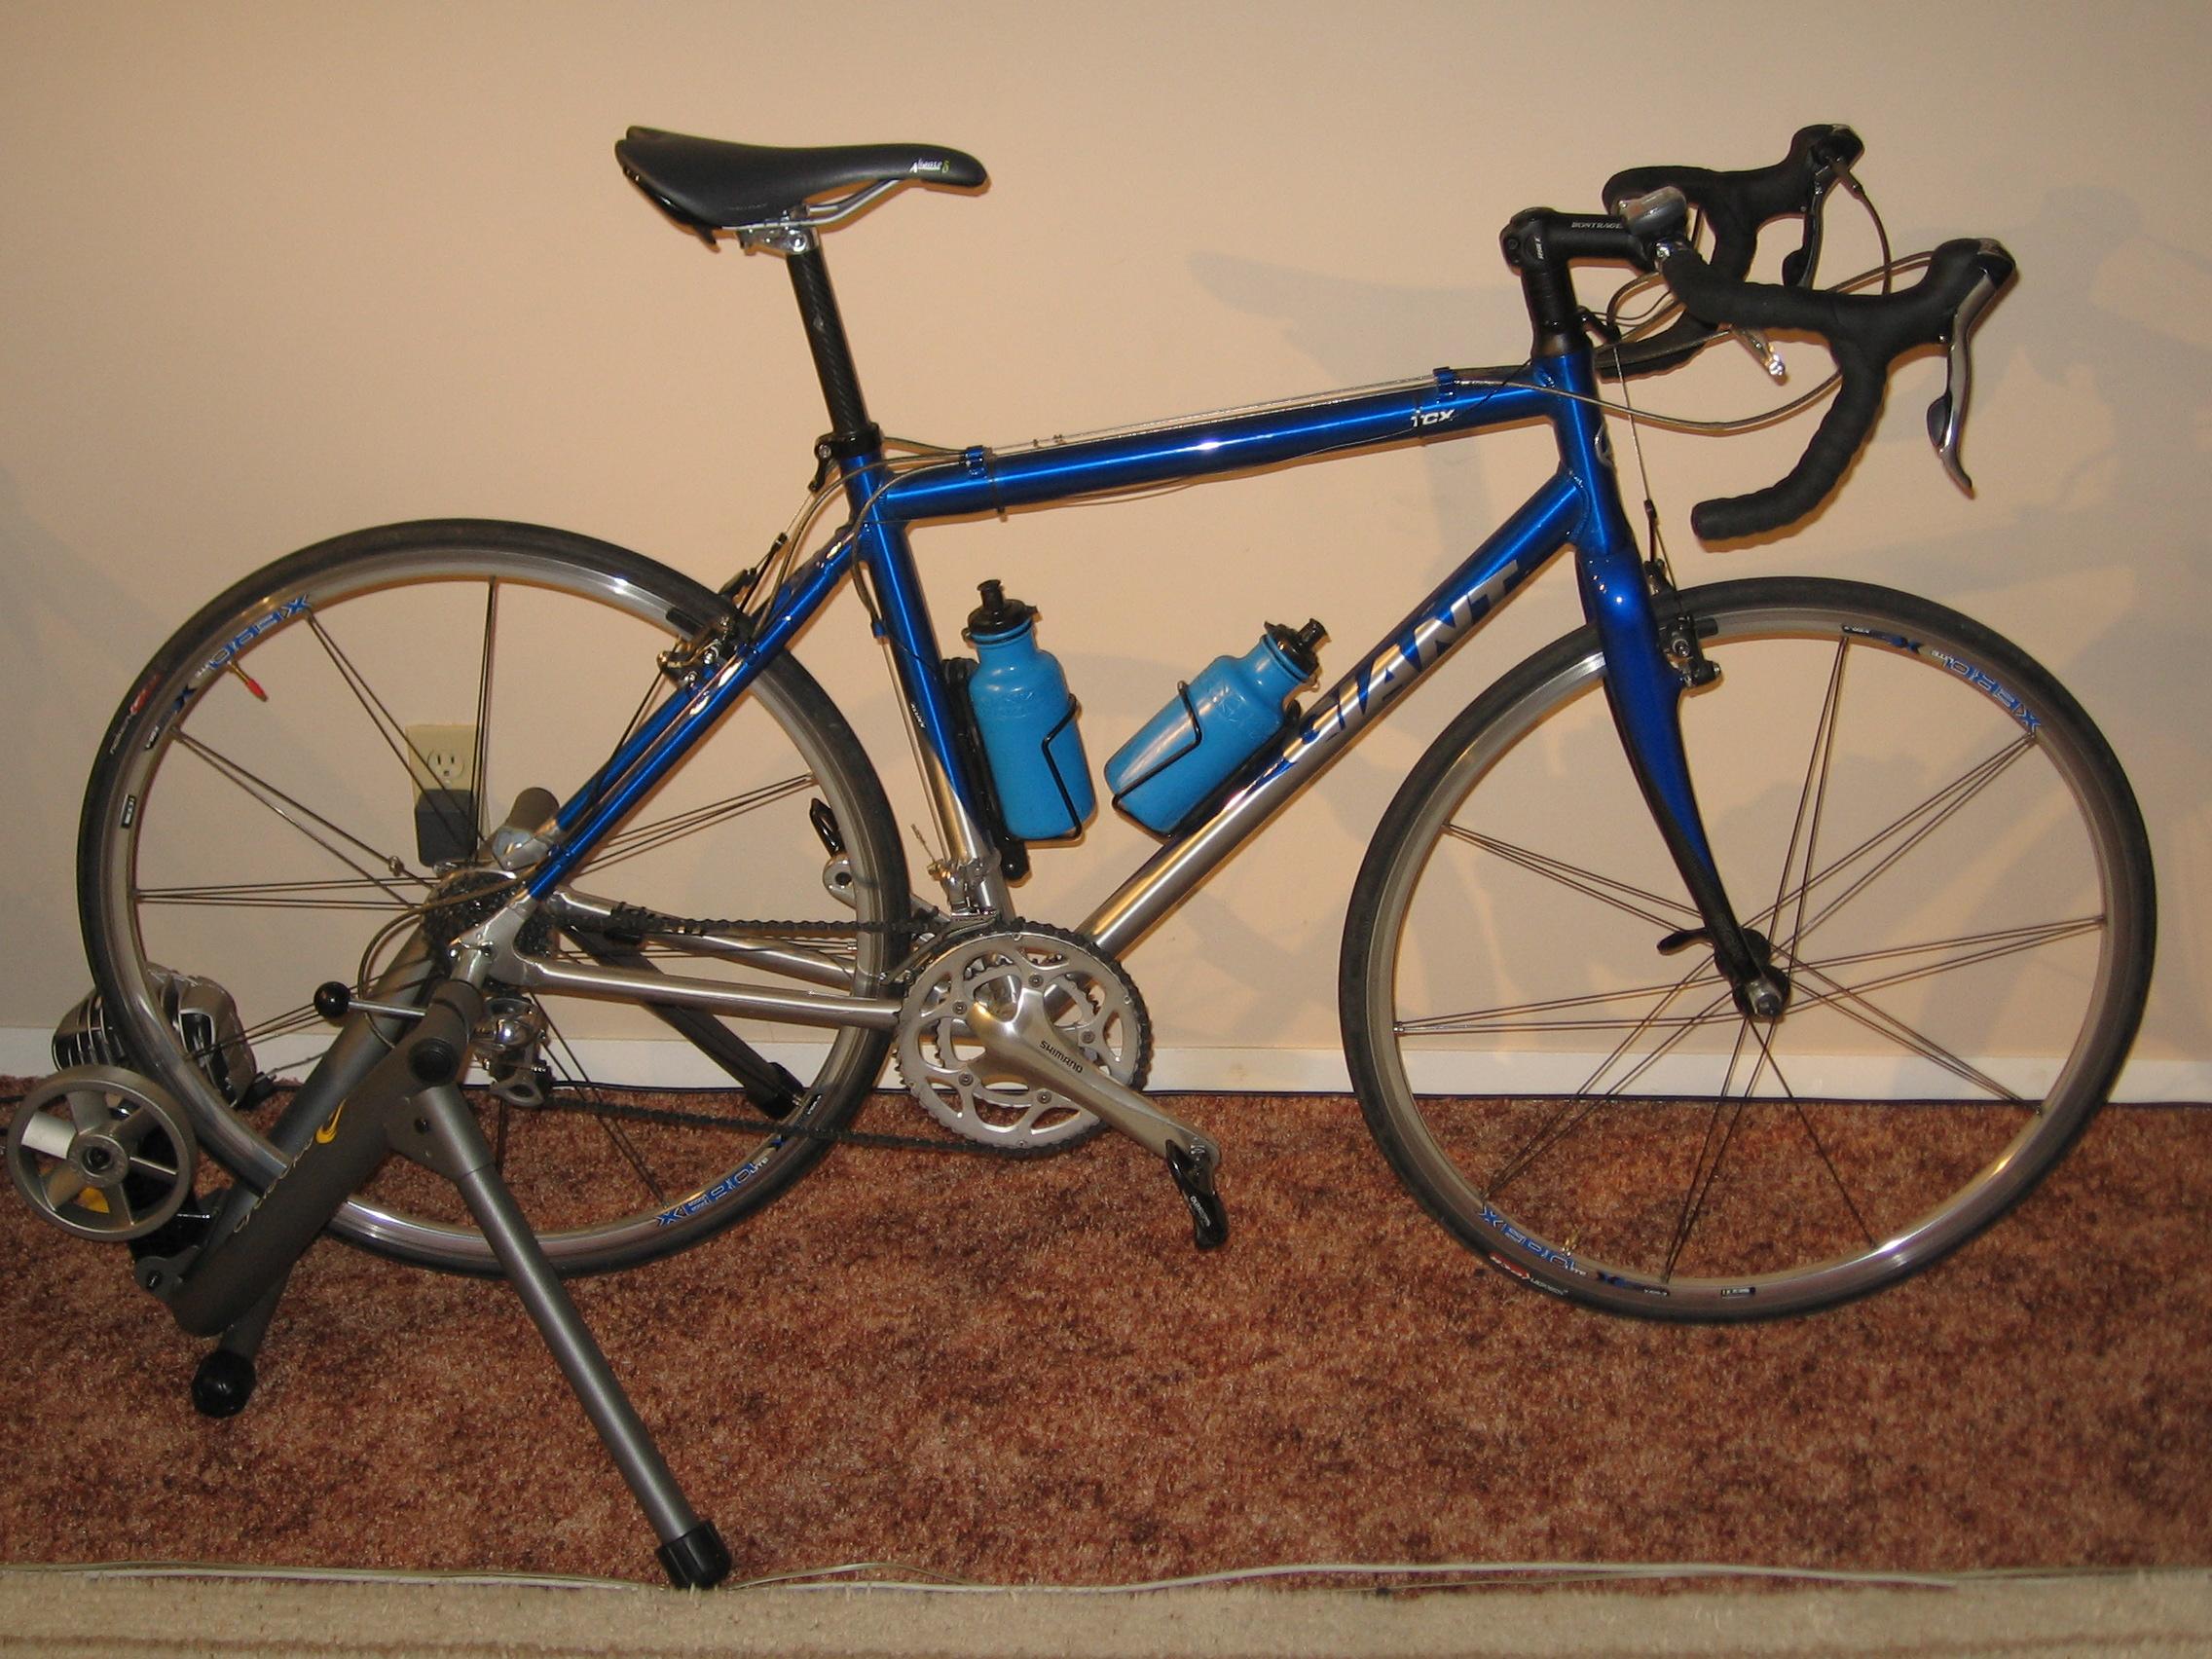 bikeTrainerpic.jpg